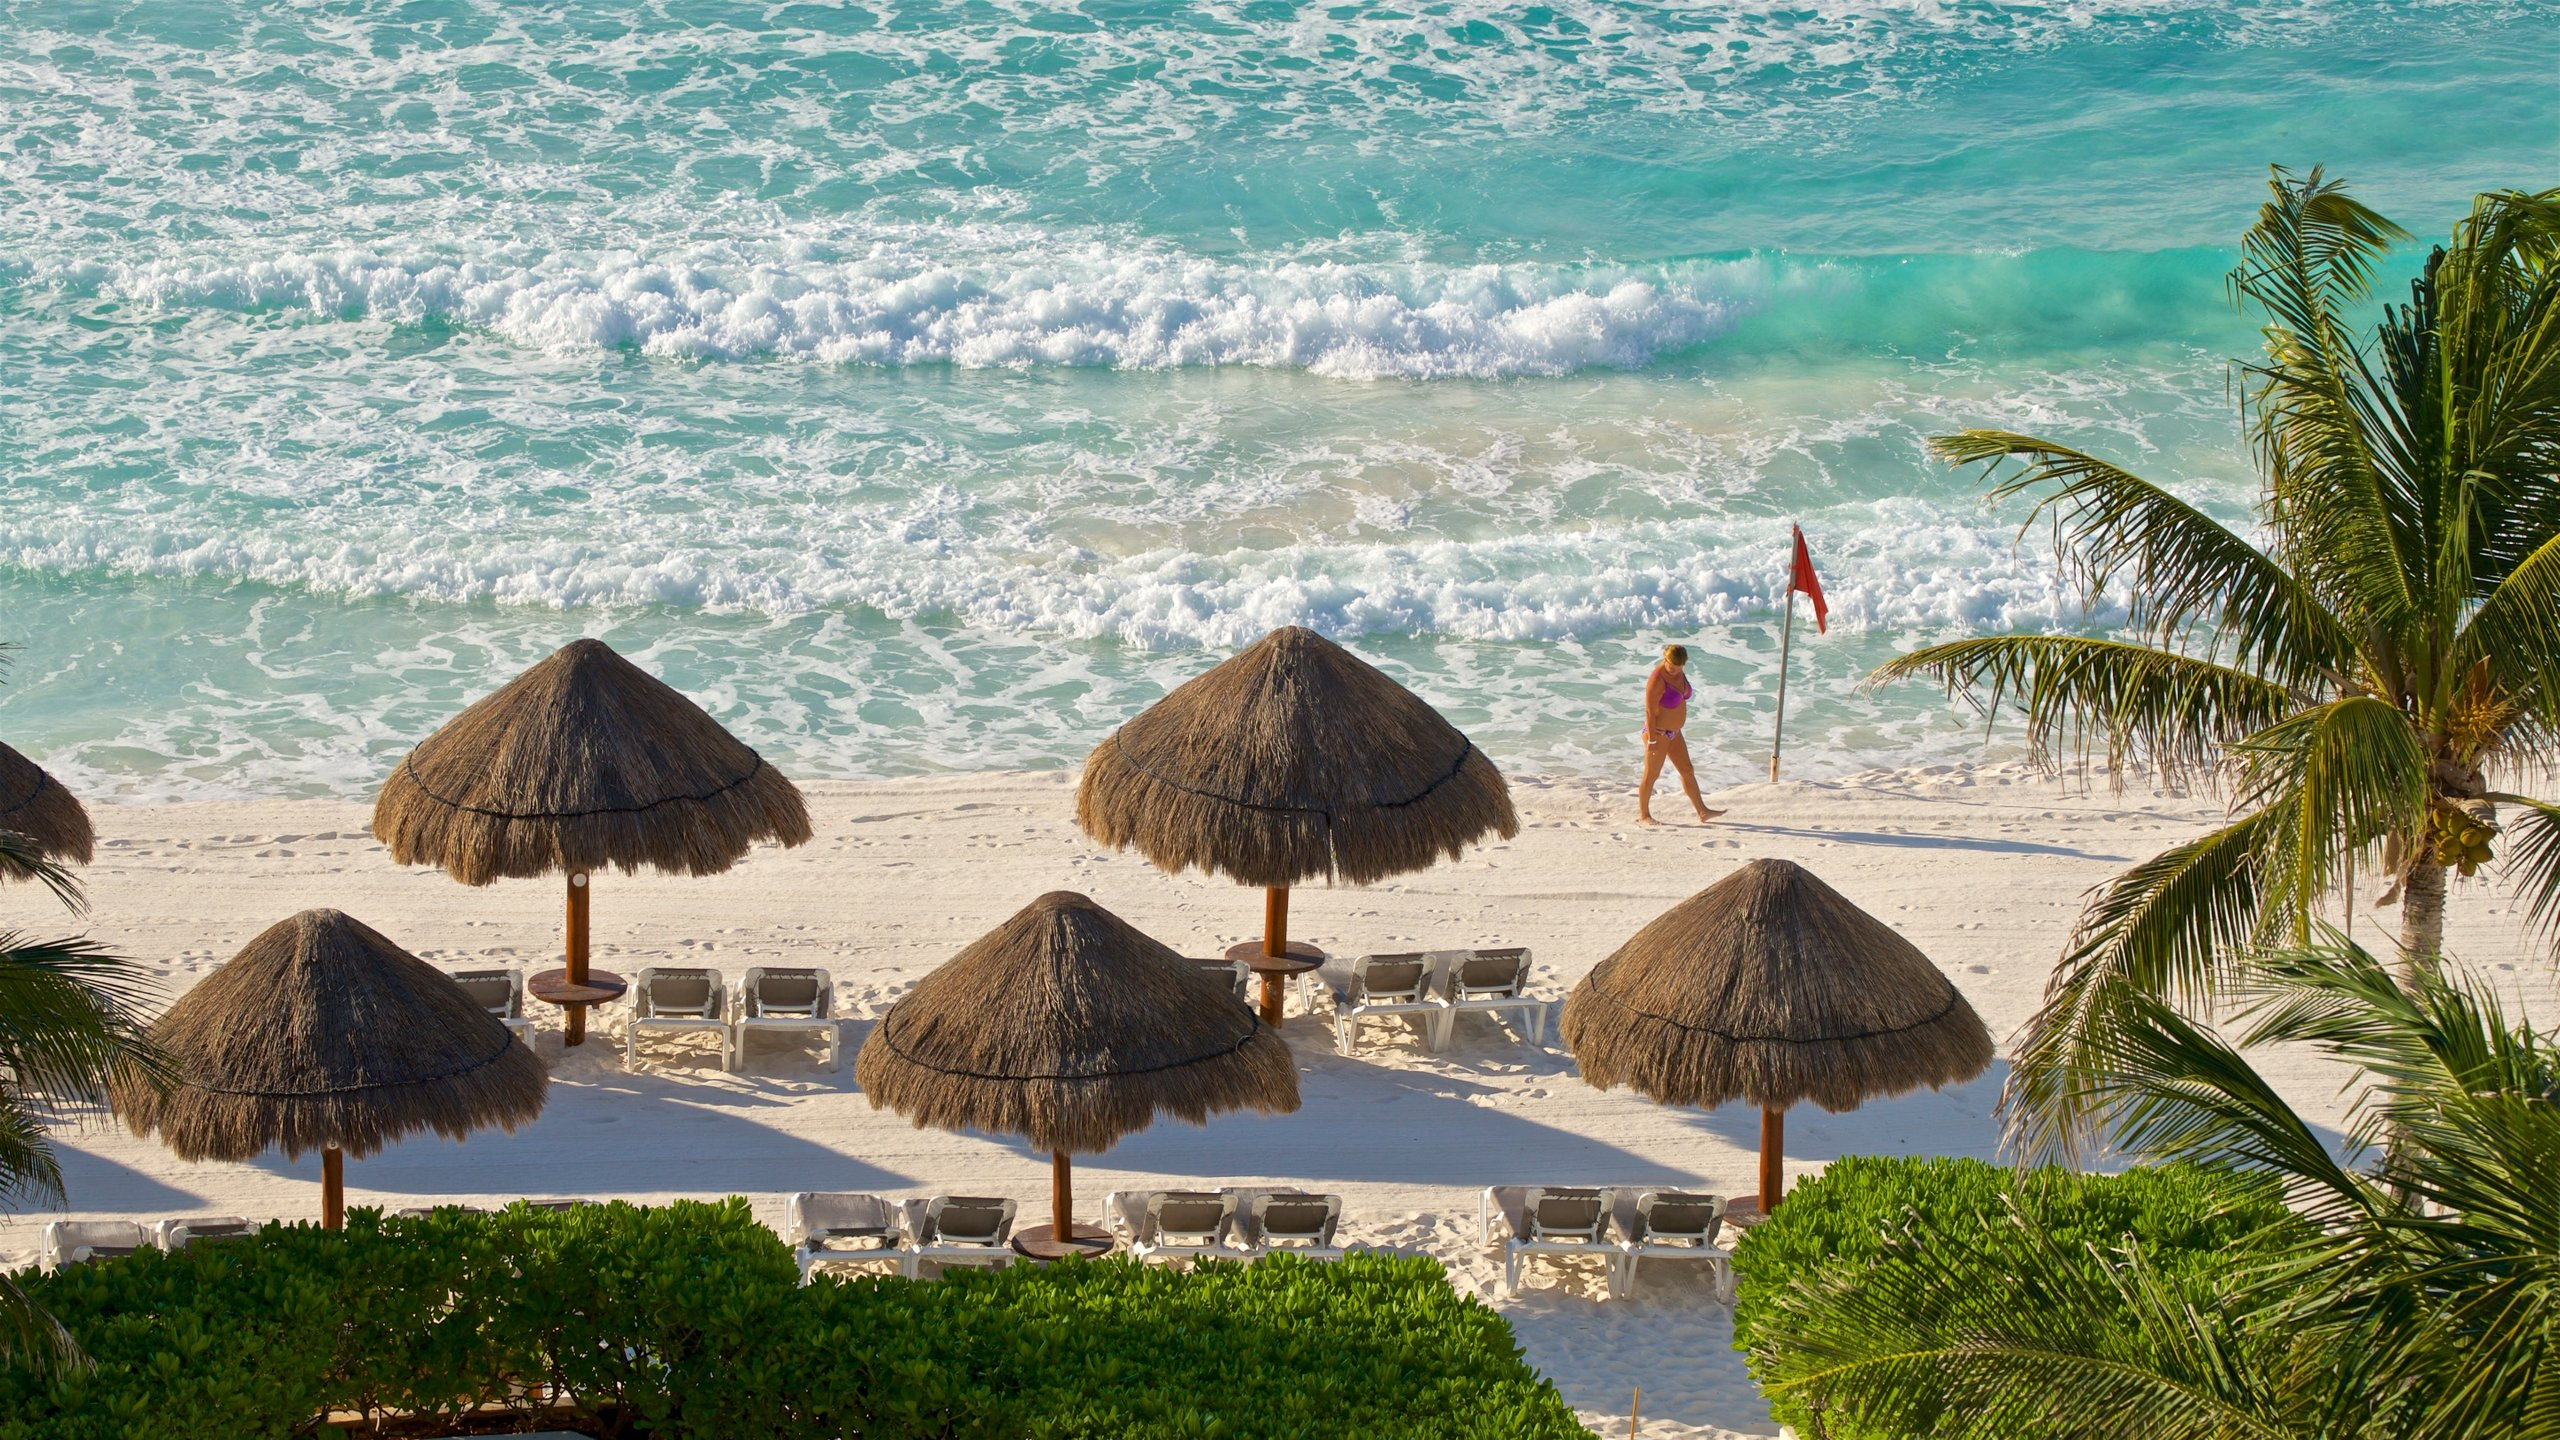 Punta Cancun, Cancun, Quintana Roo, Mexico